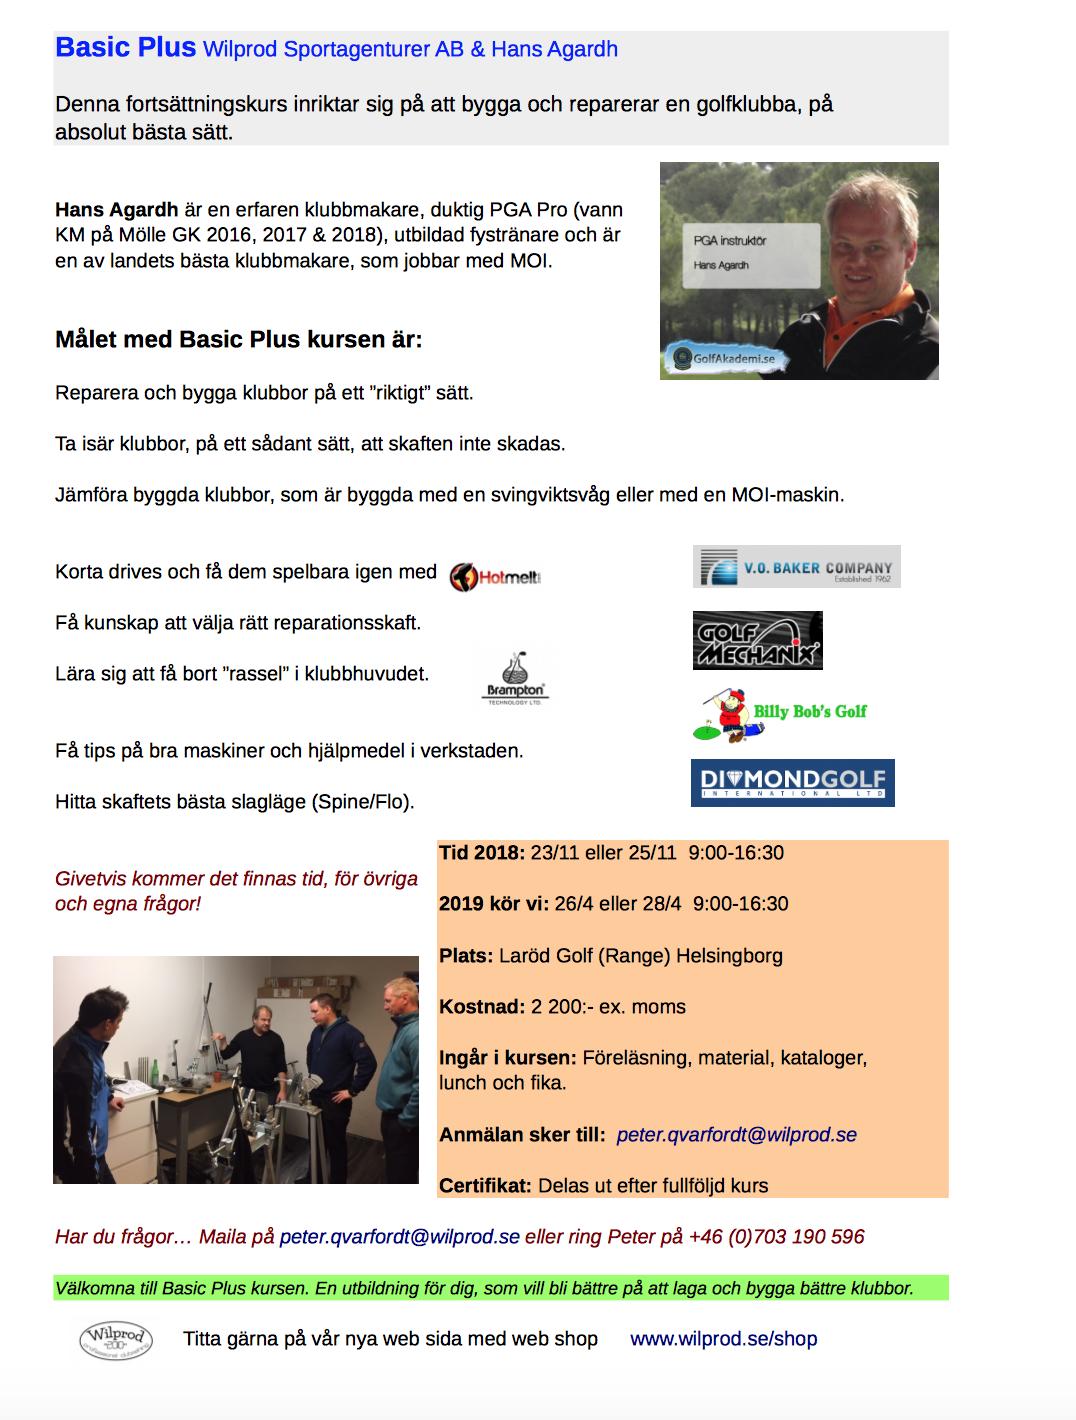 Basic Plus Wilprod Sportagenturer AB & Hans Agardh